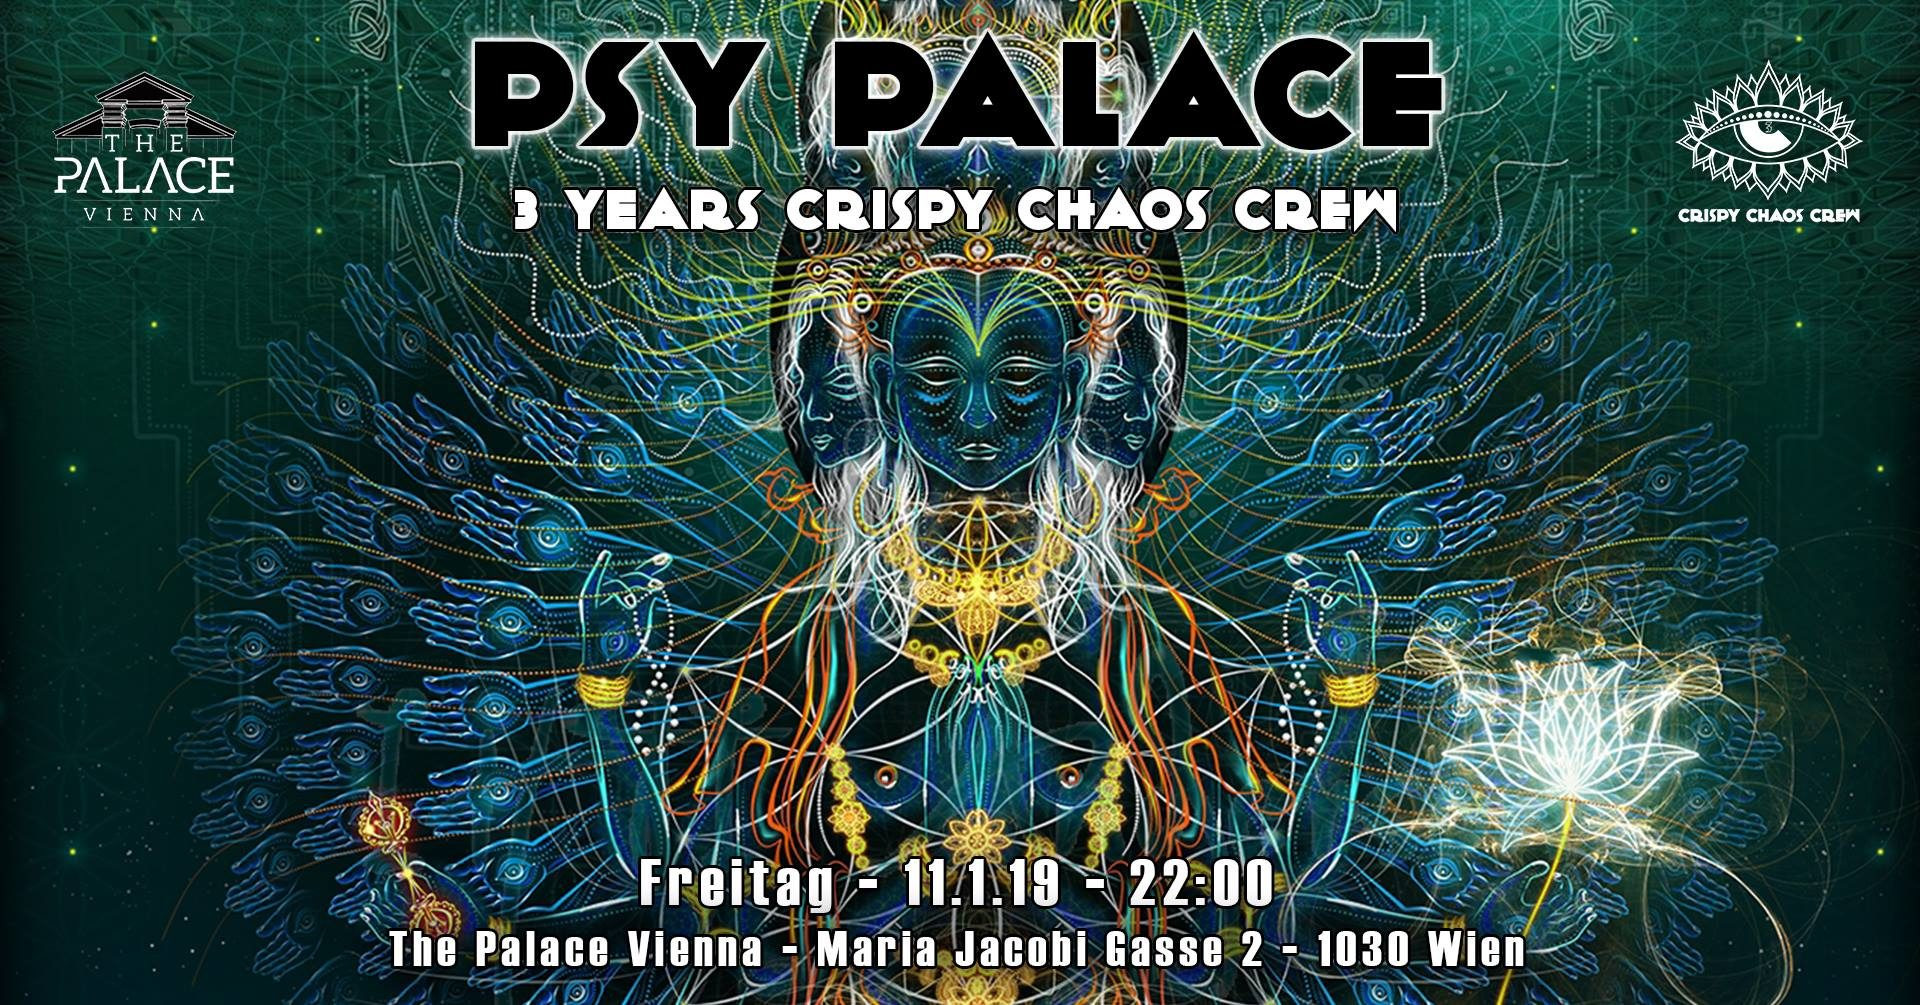 Psy Palace - 3 Years Crispy Chaos Crew am 11. January 2019 @ The Palace Vienna.